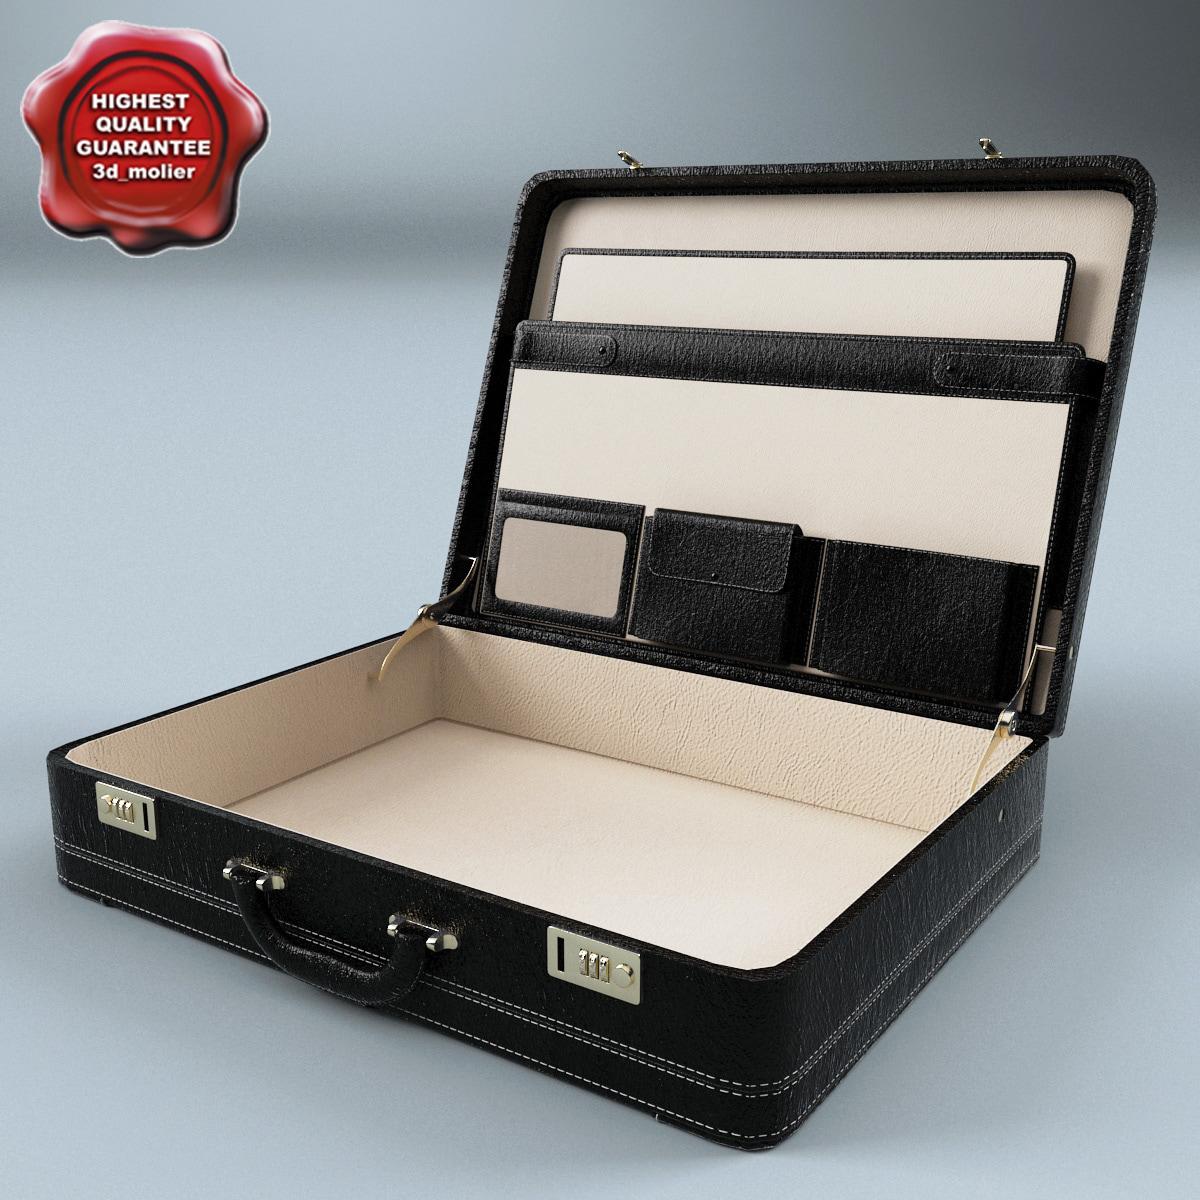 Suitcase_V7_00.jpg